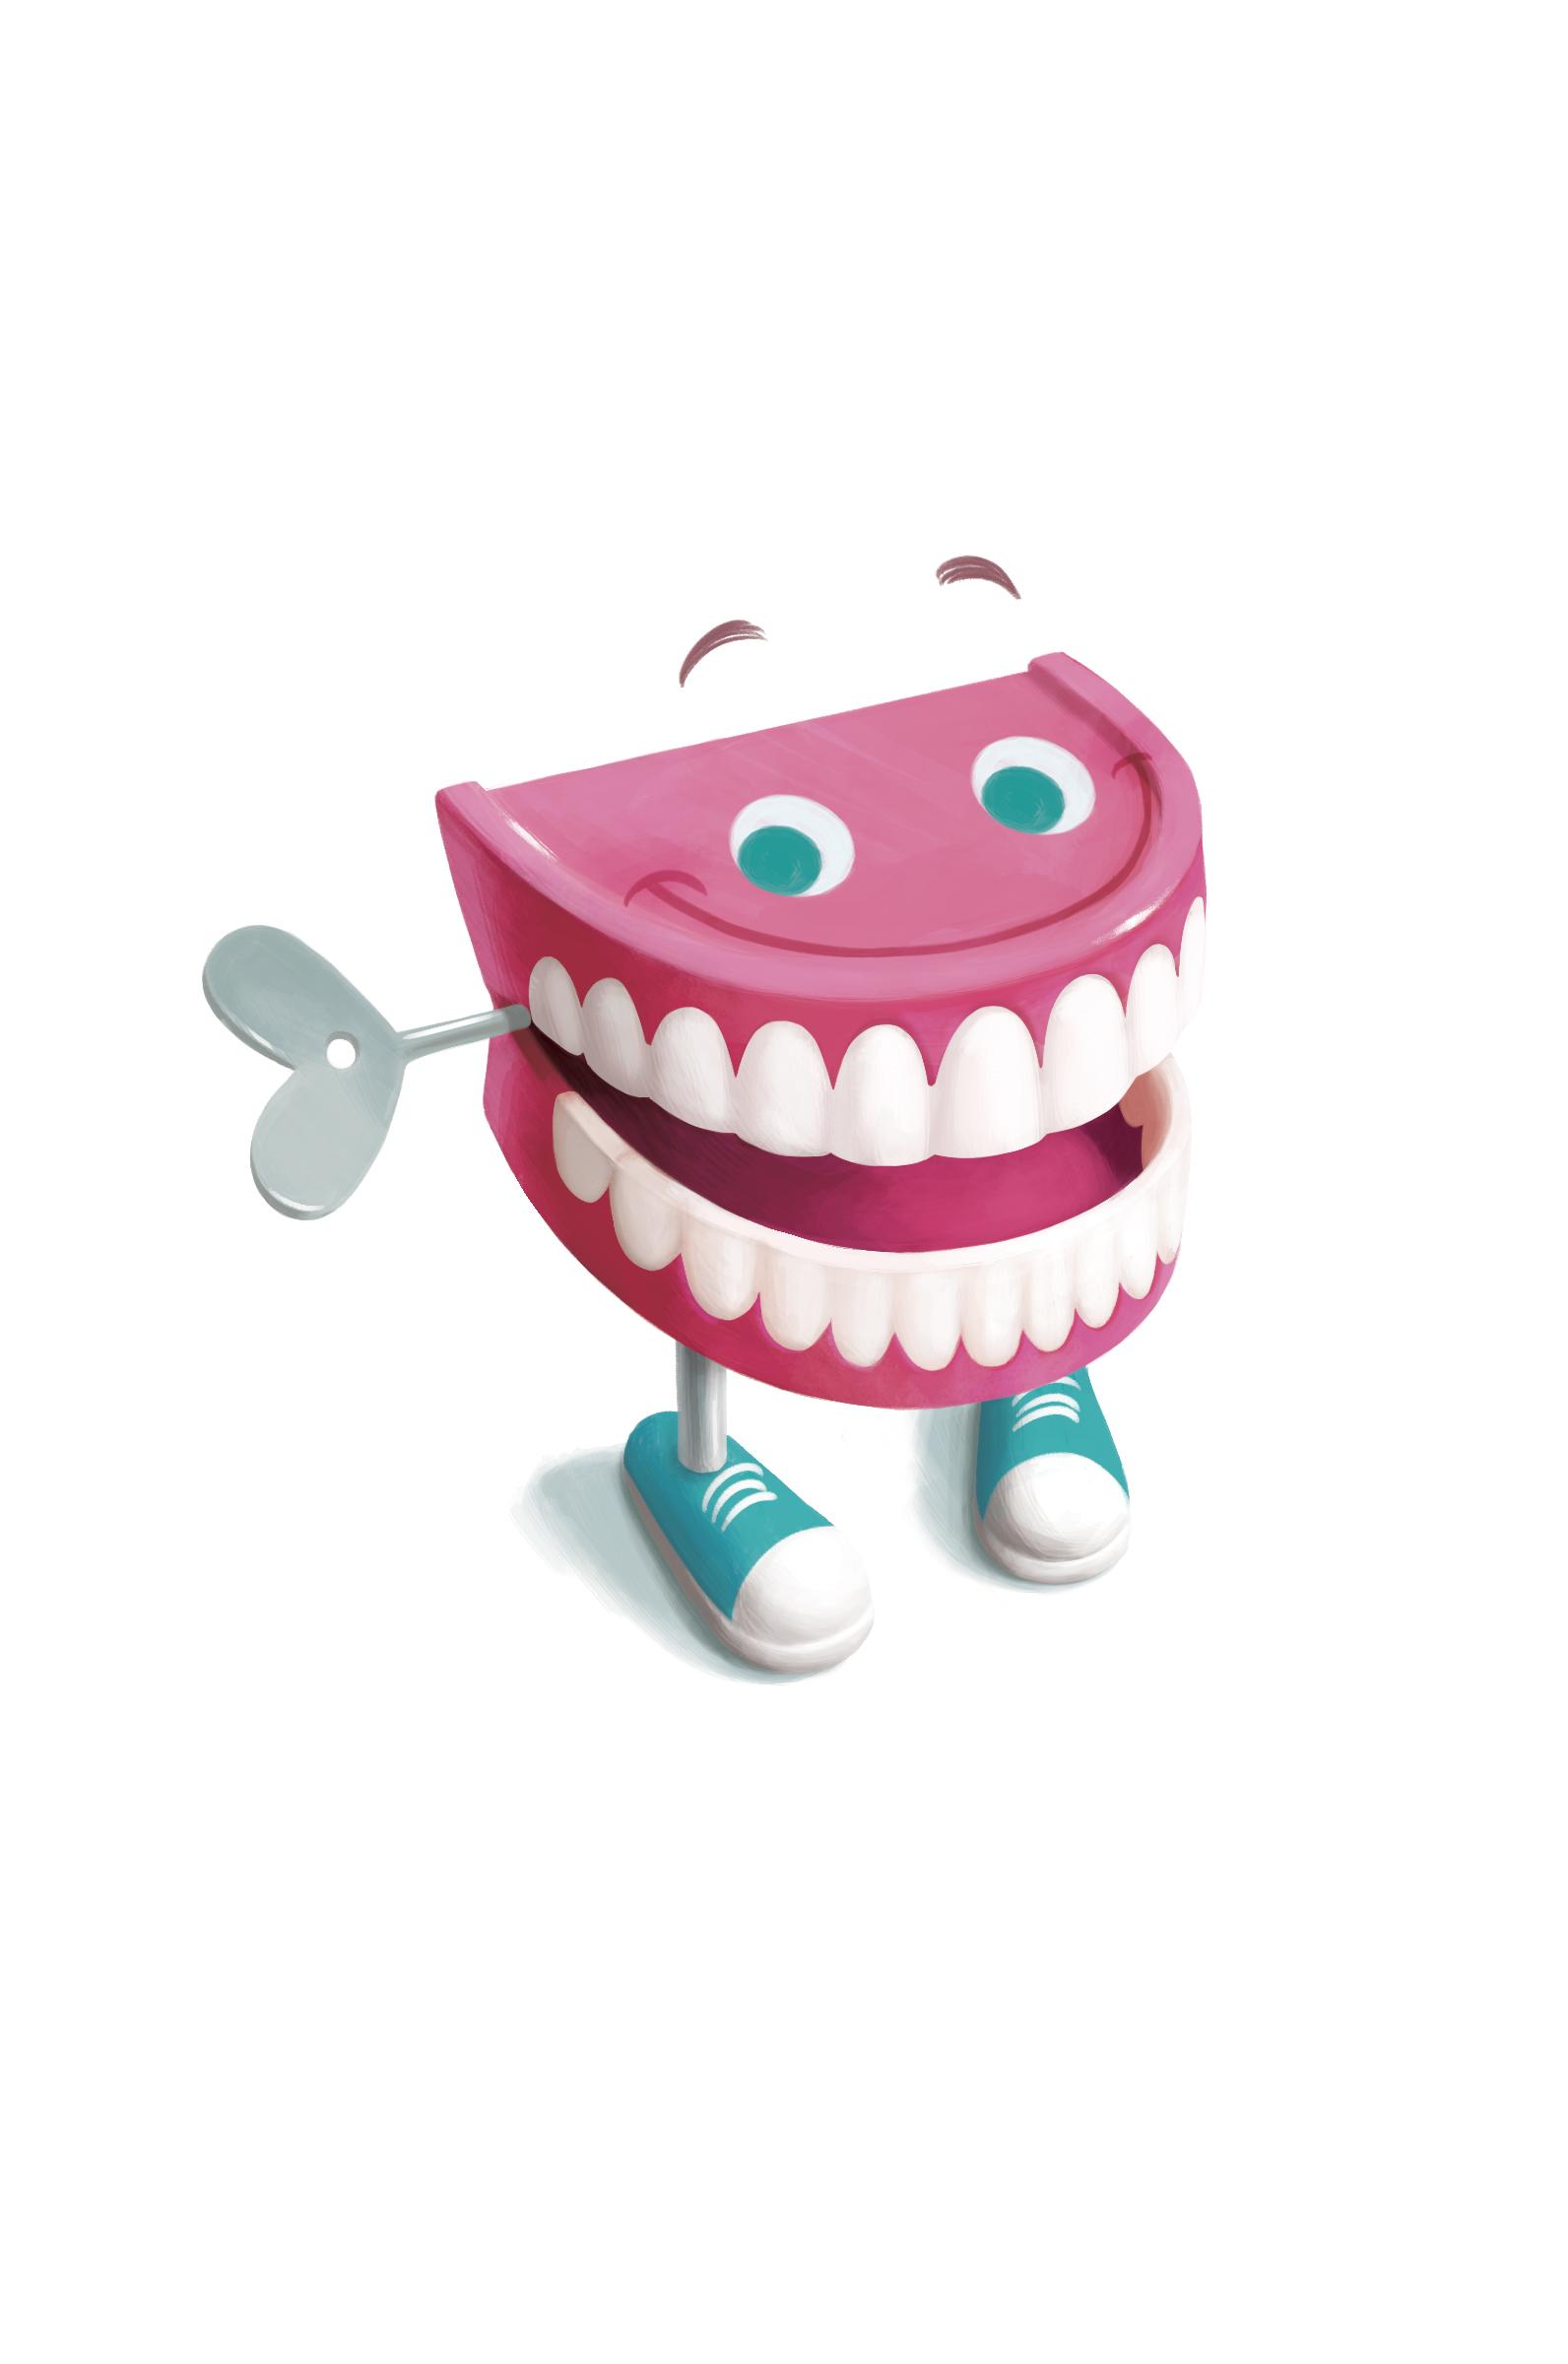 Teeth_KaceySchwartz.jpg